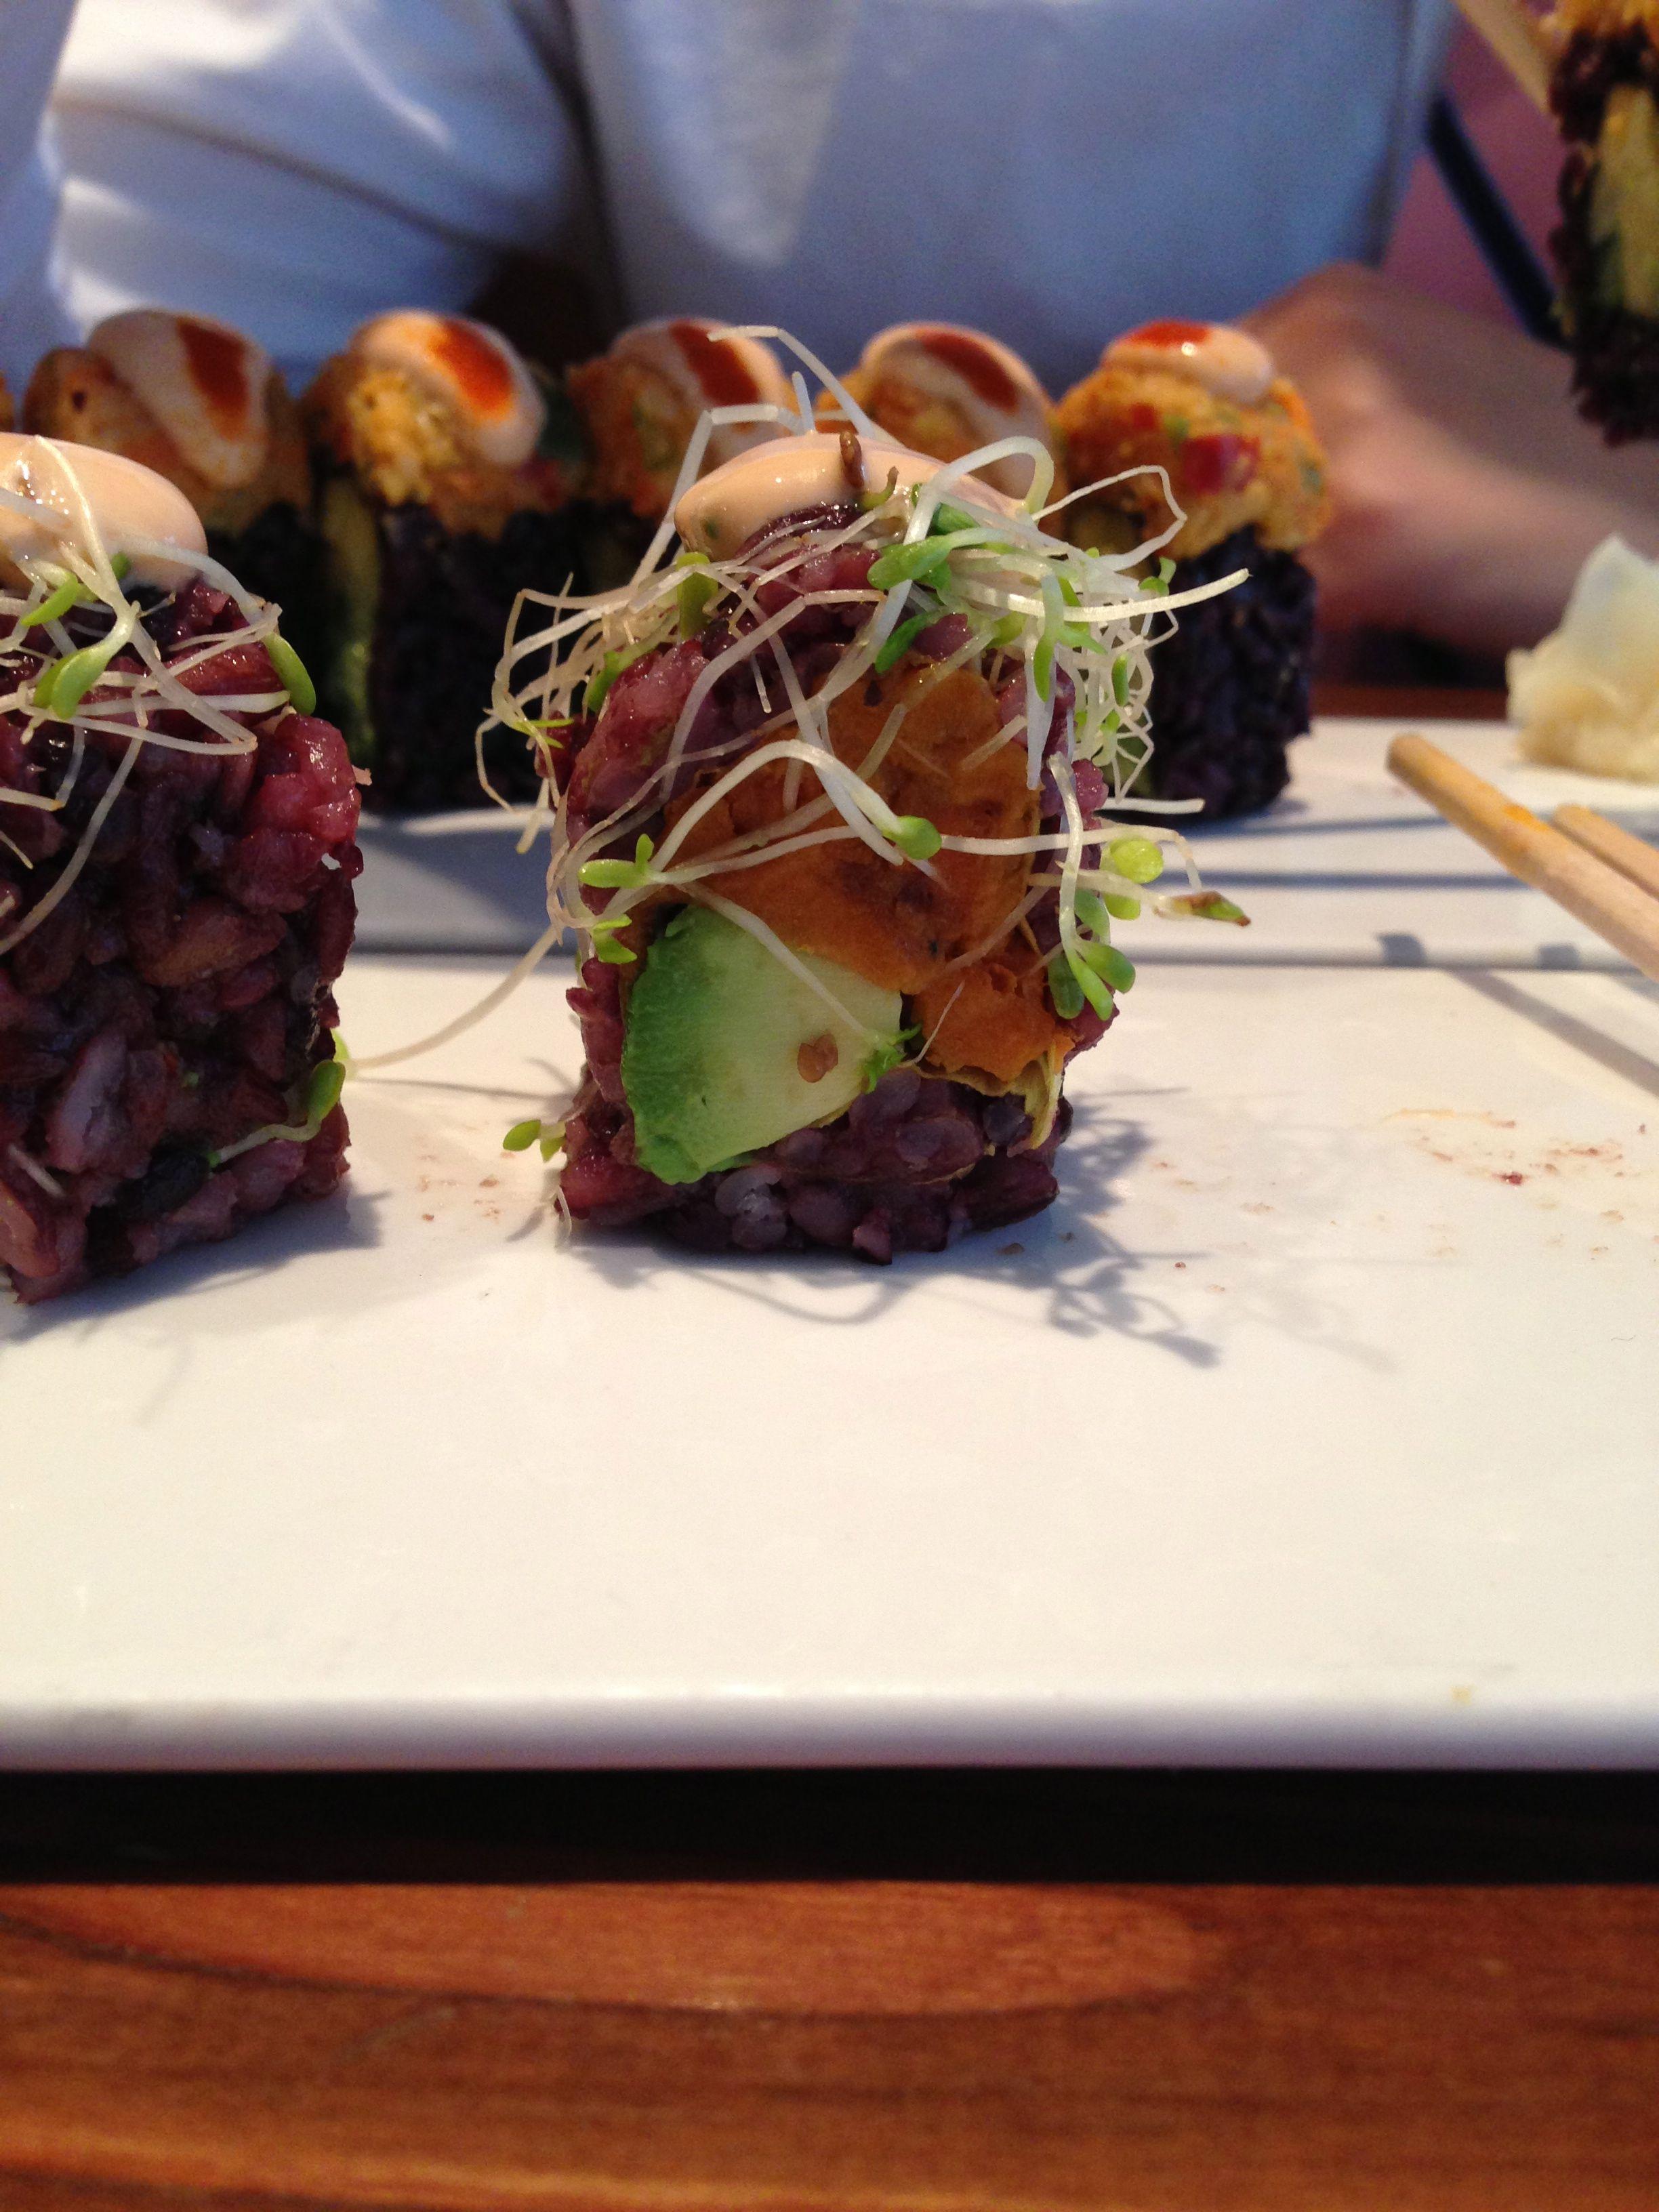 #vegan #sushi - avocado, sweet potato, alfalfa sprouts